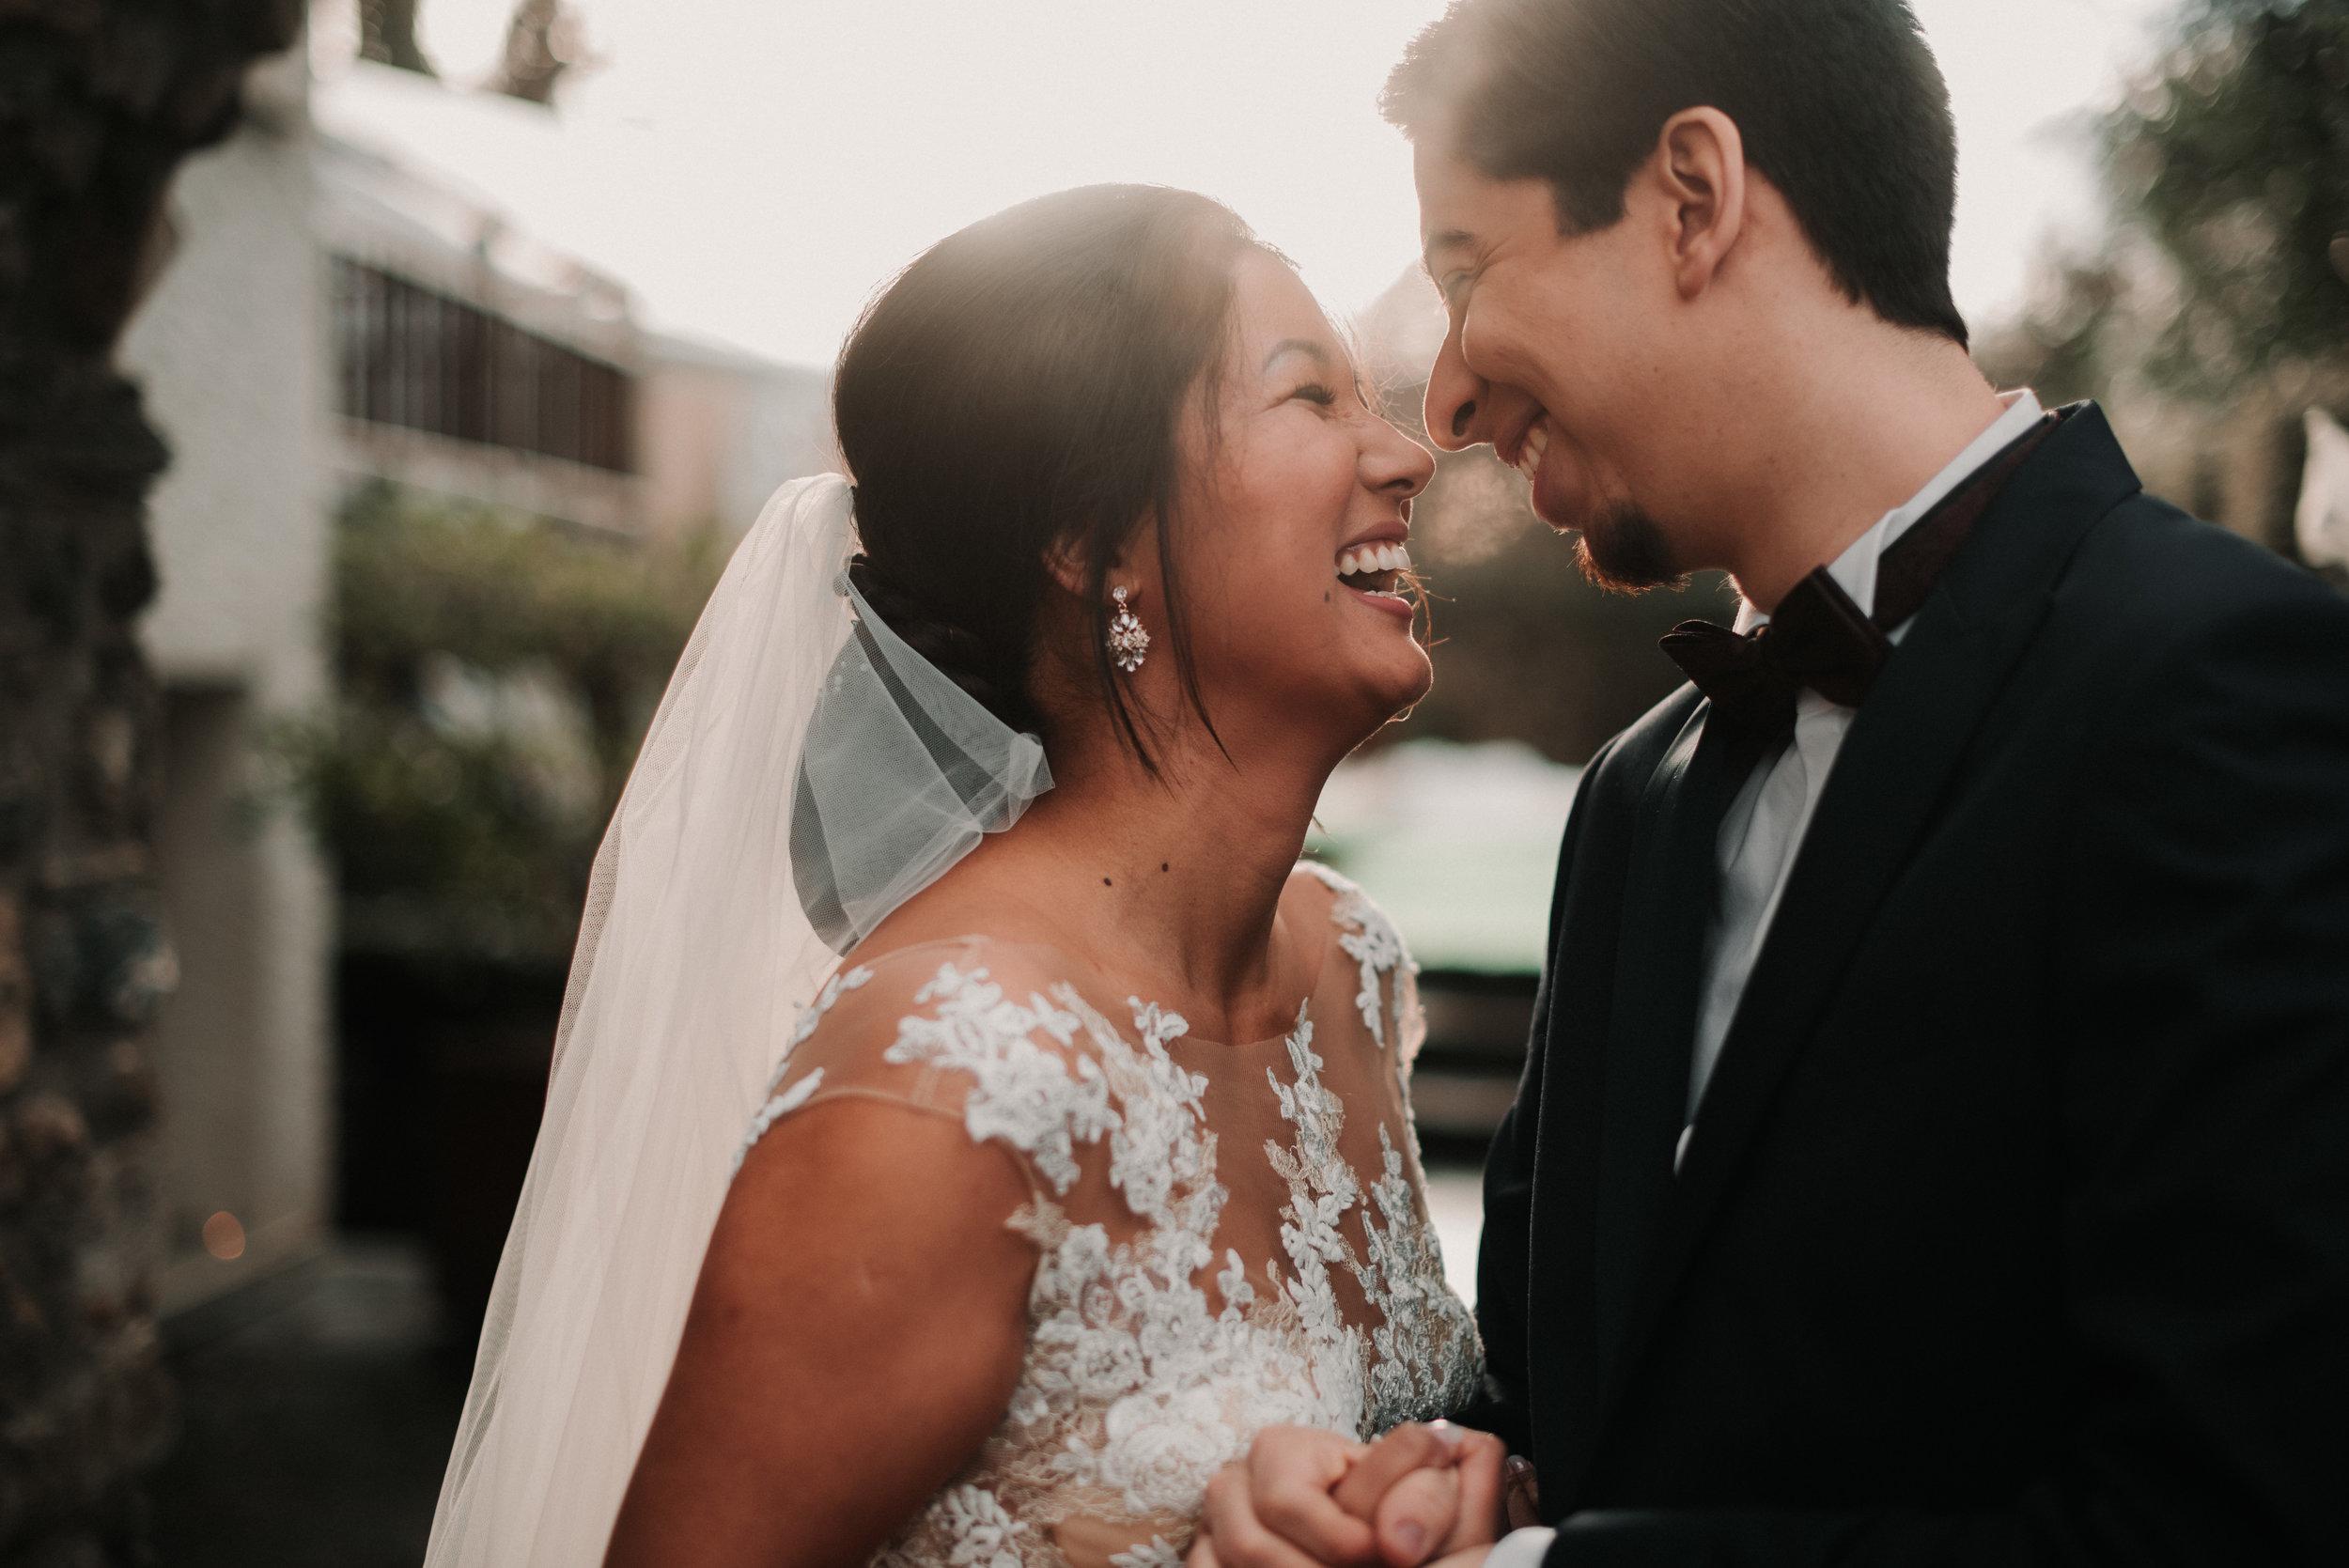 Léa-Fery-photographe-professionnel-lyon-rhone-alpes-portrait-mariage.jpg